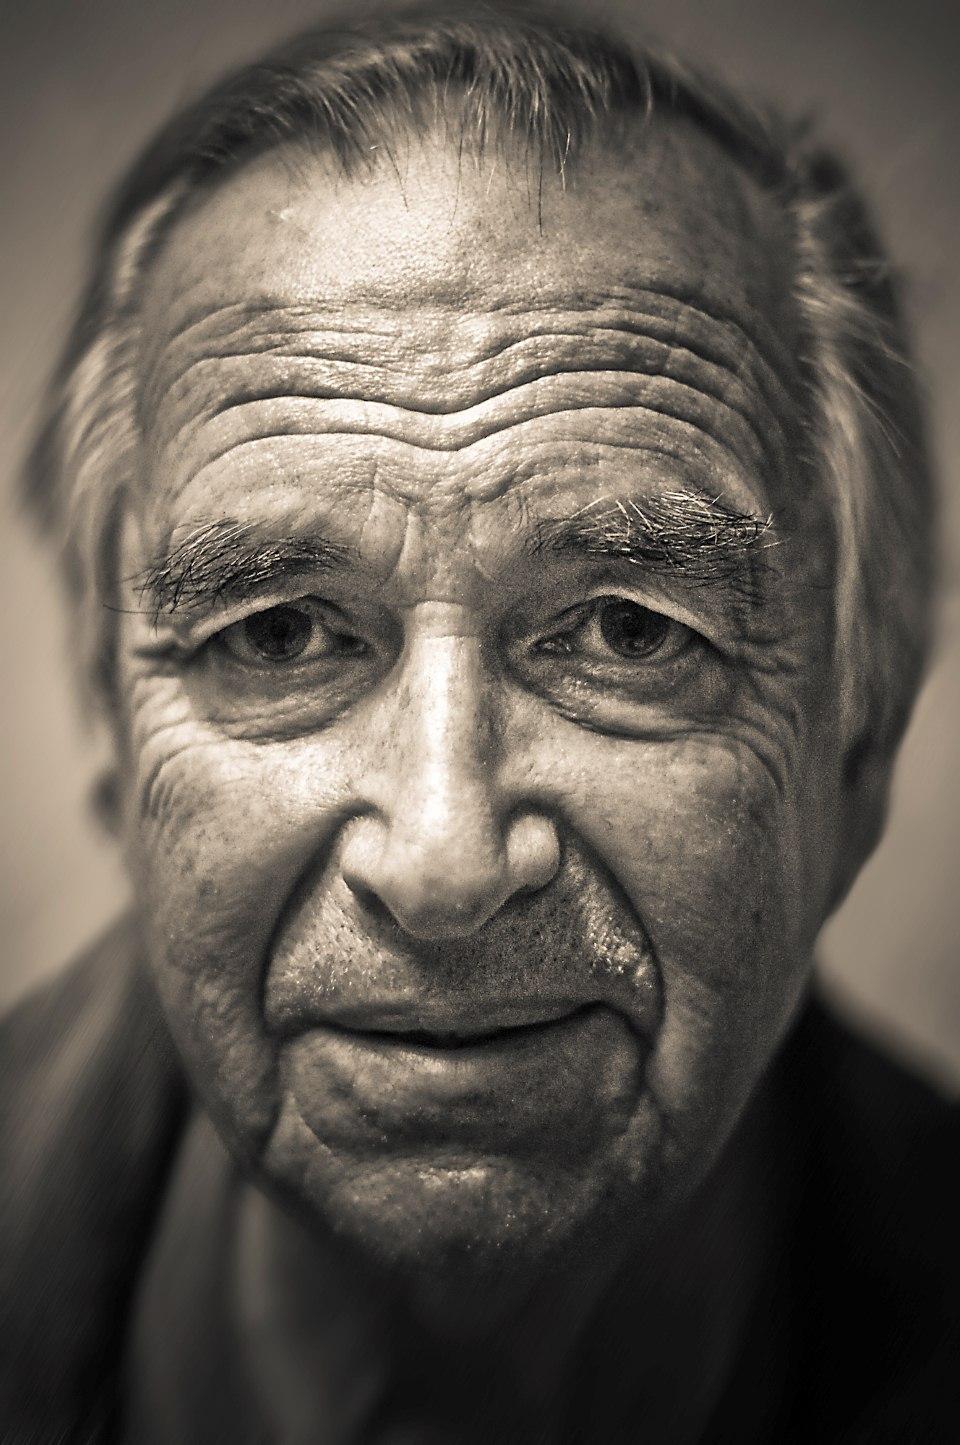 Portraits by Mishel Vermishel